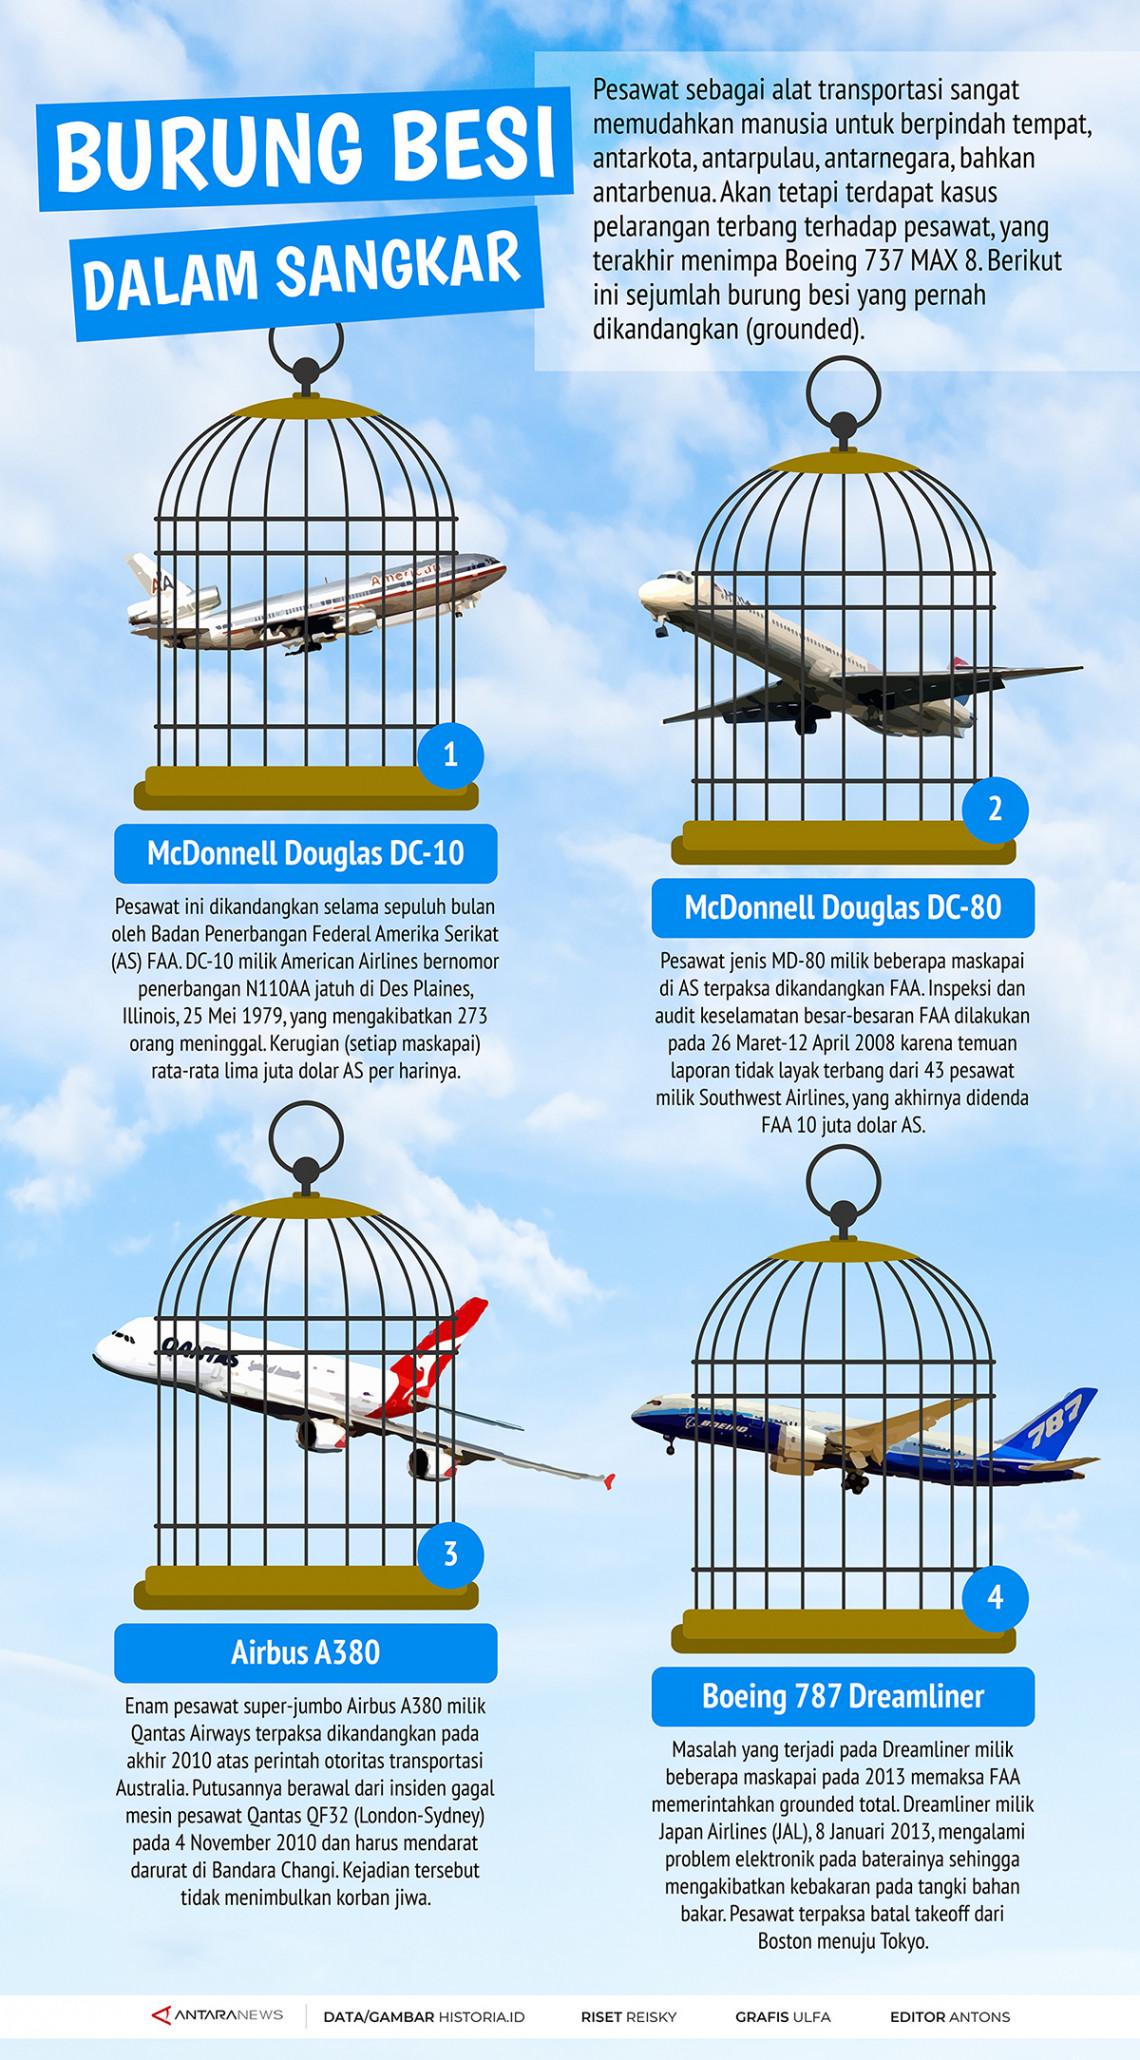 Burung Besi dalam Sangkar